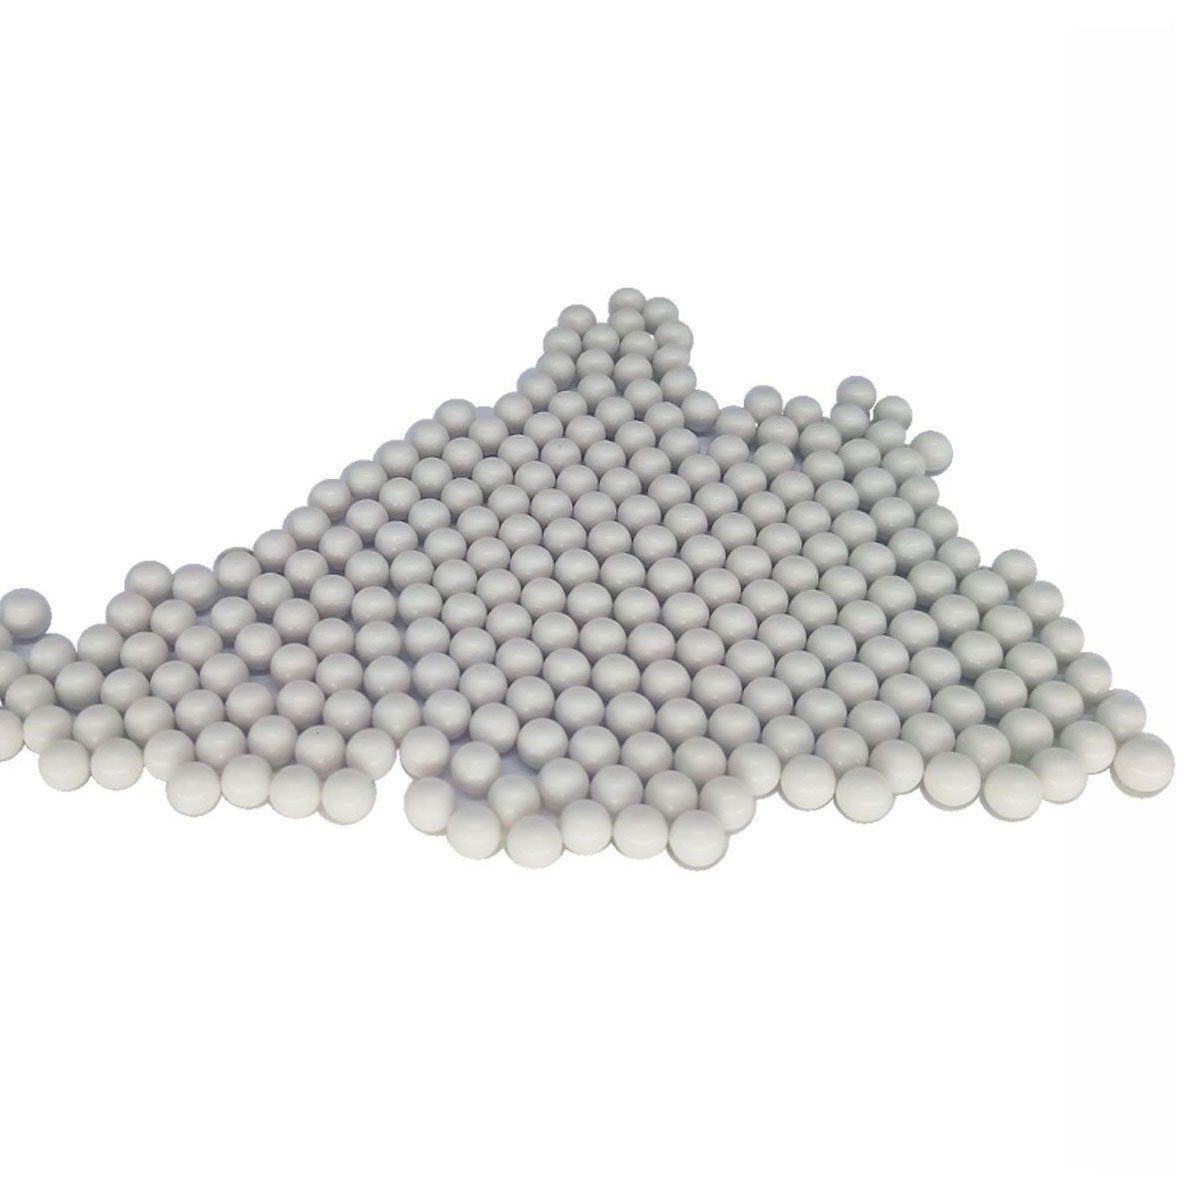 Esferas Plásticas BBs BB King Calibre 6mm 0,20g 4000un